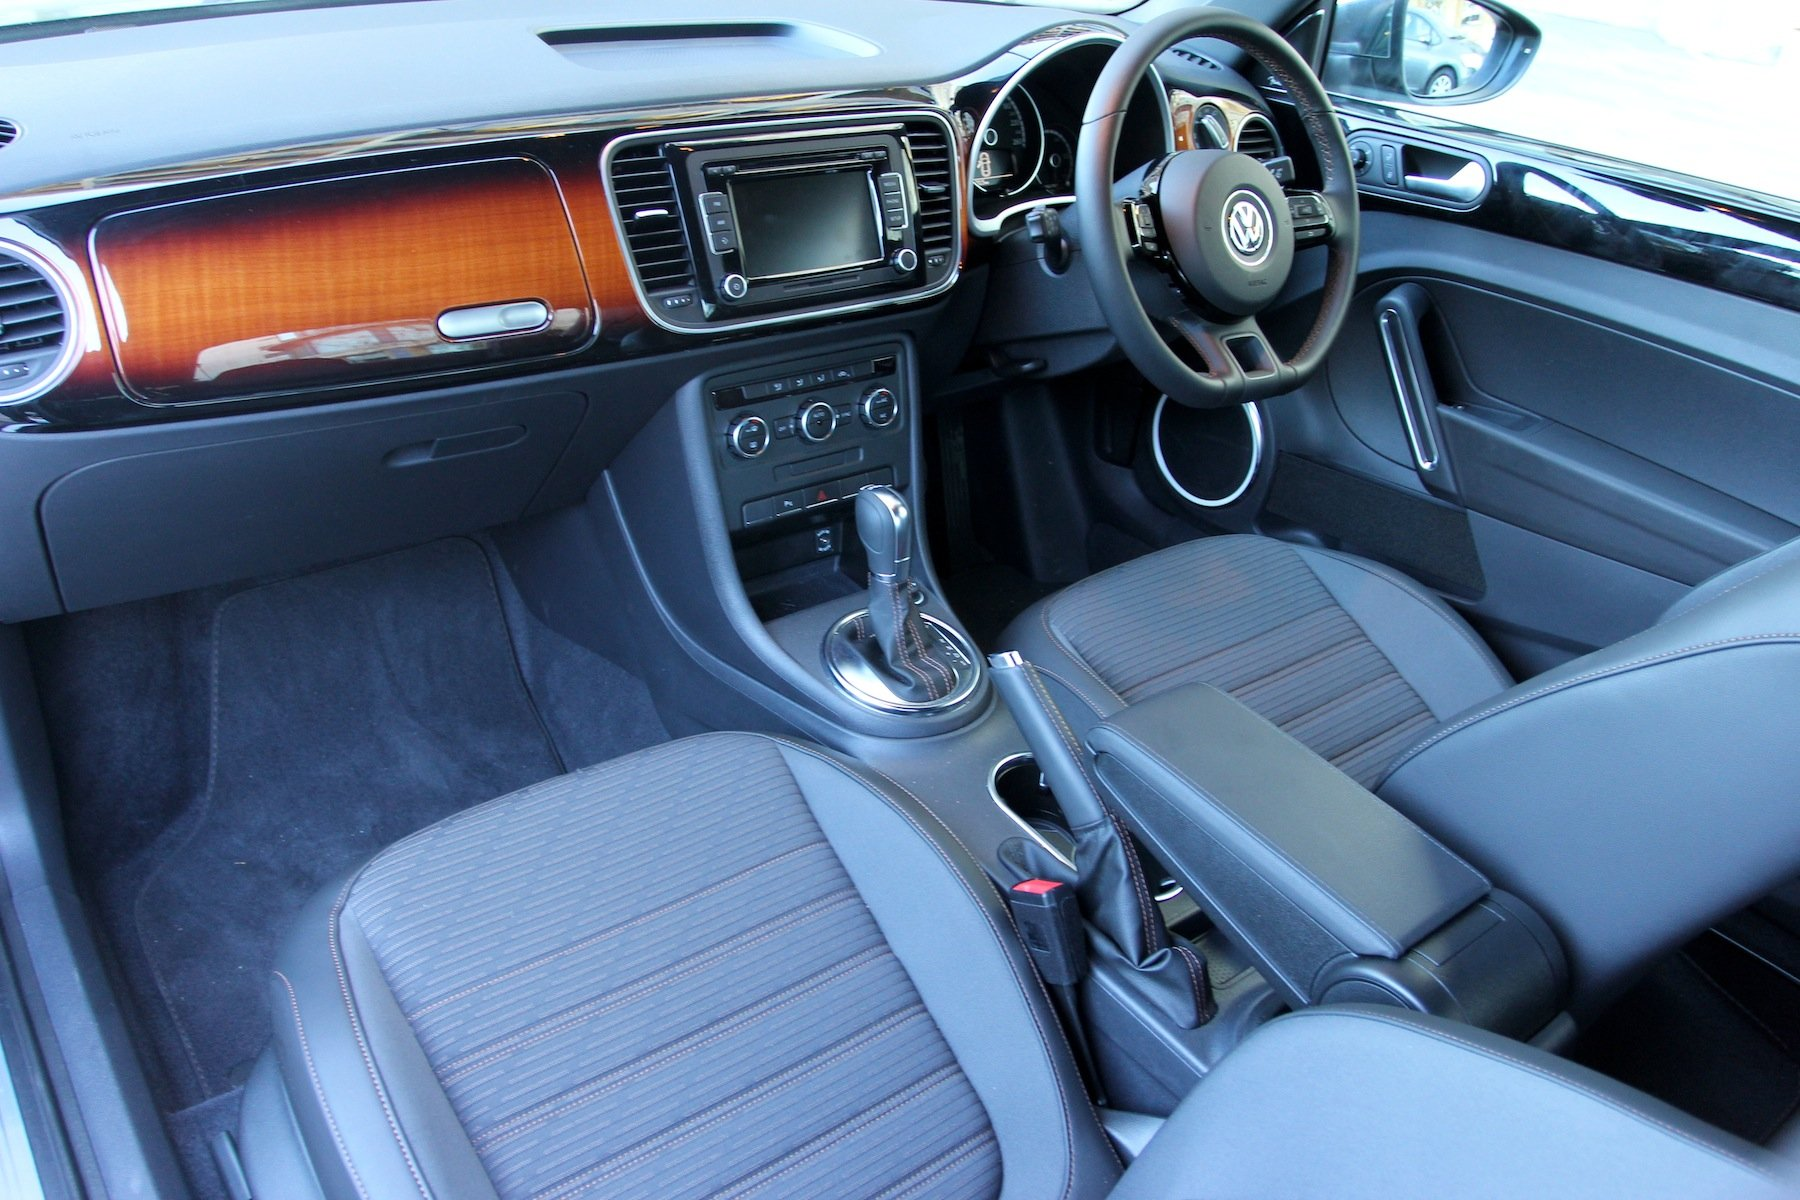 Images volkswagen coccinelle fender volkswagen coccinelle fender en - Volkswagen Beetle Review Fender Edition